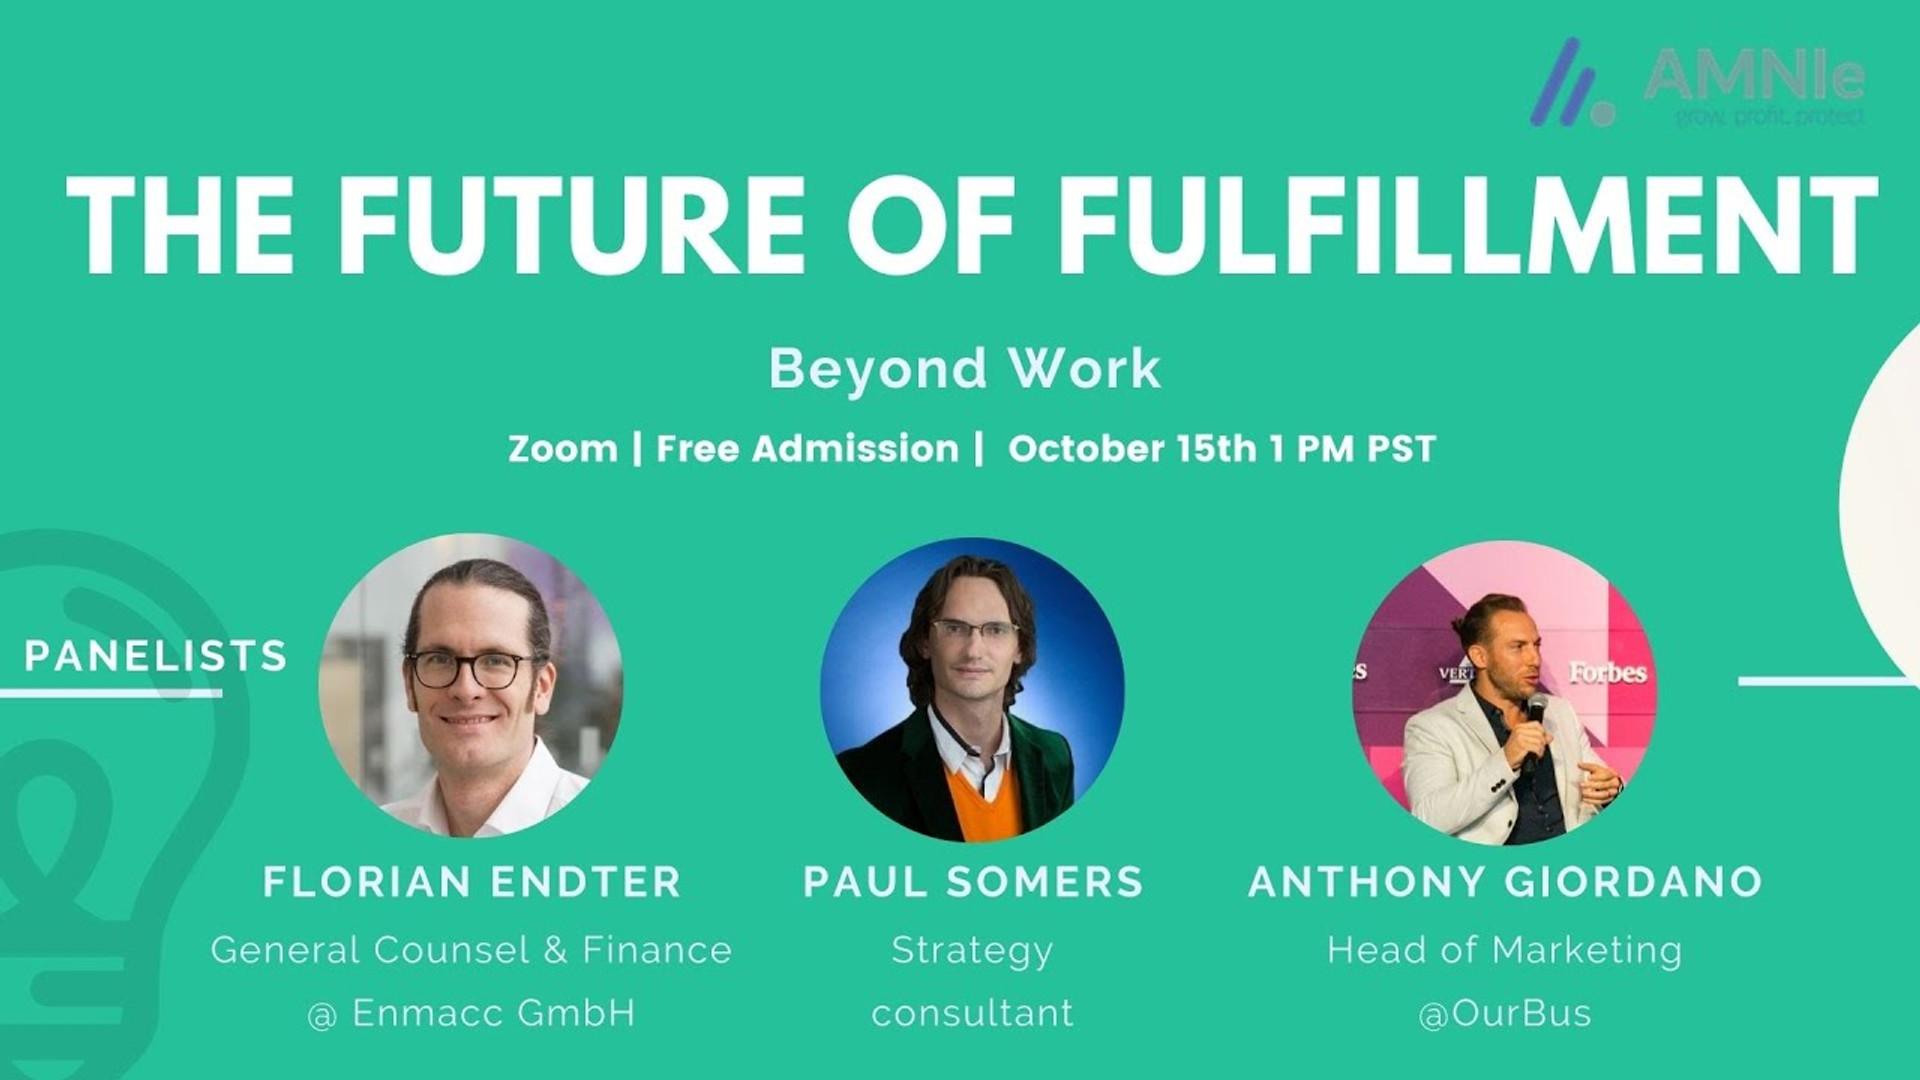 The Future of Fulfillment